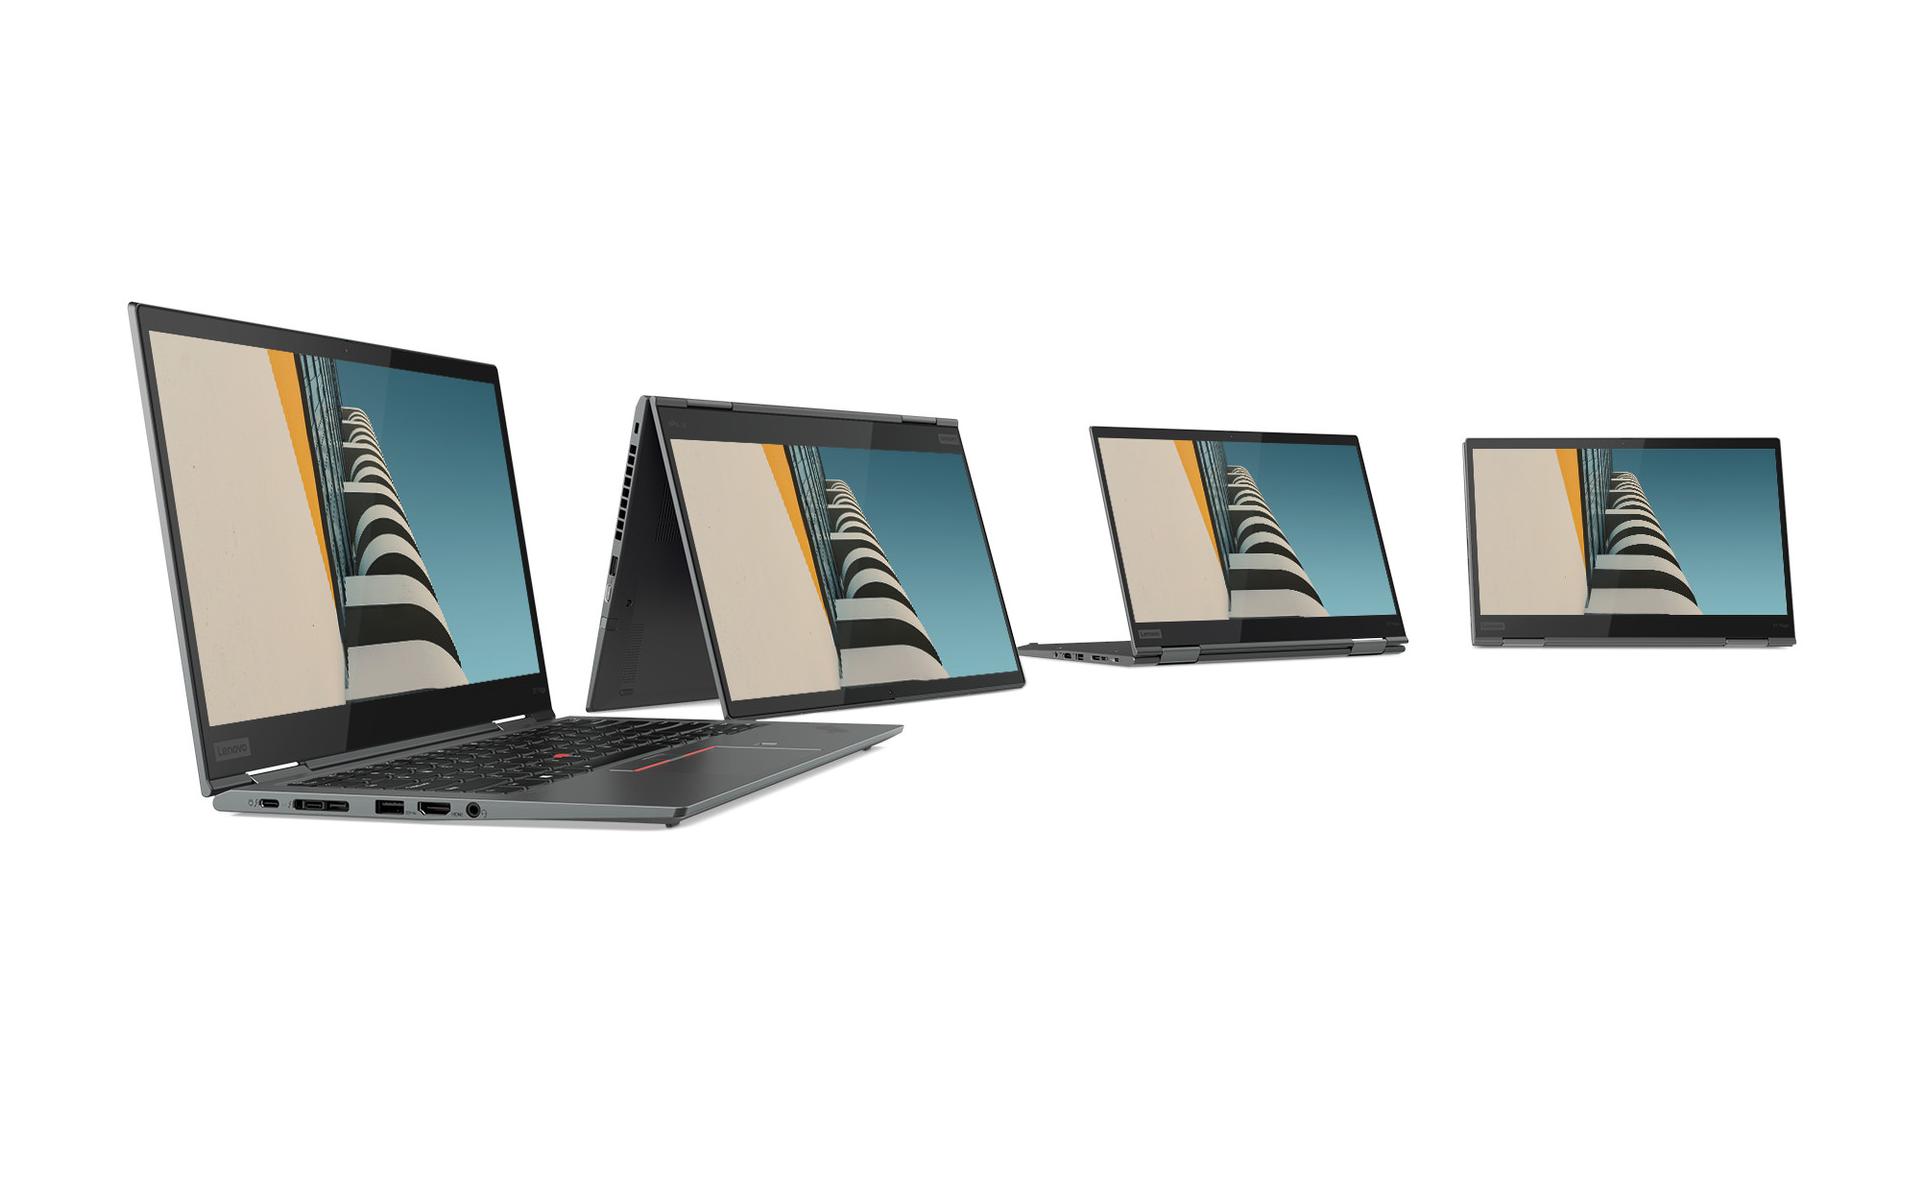 Lenovo ThinkPad X1 Yoga G4  - shop.bb-net.de